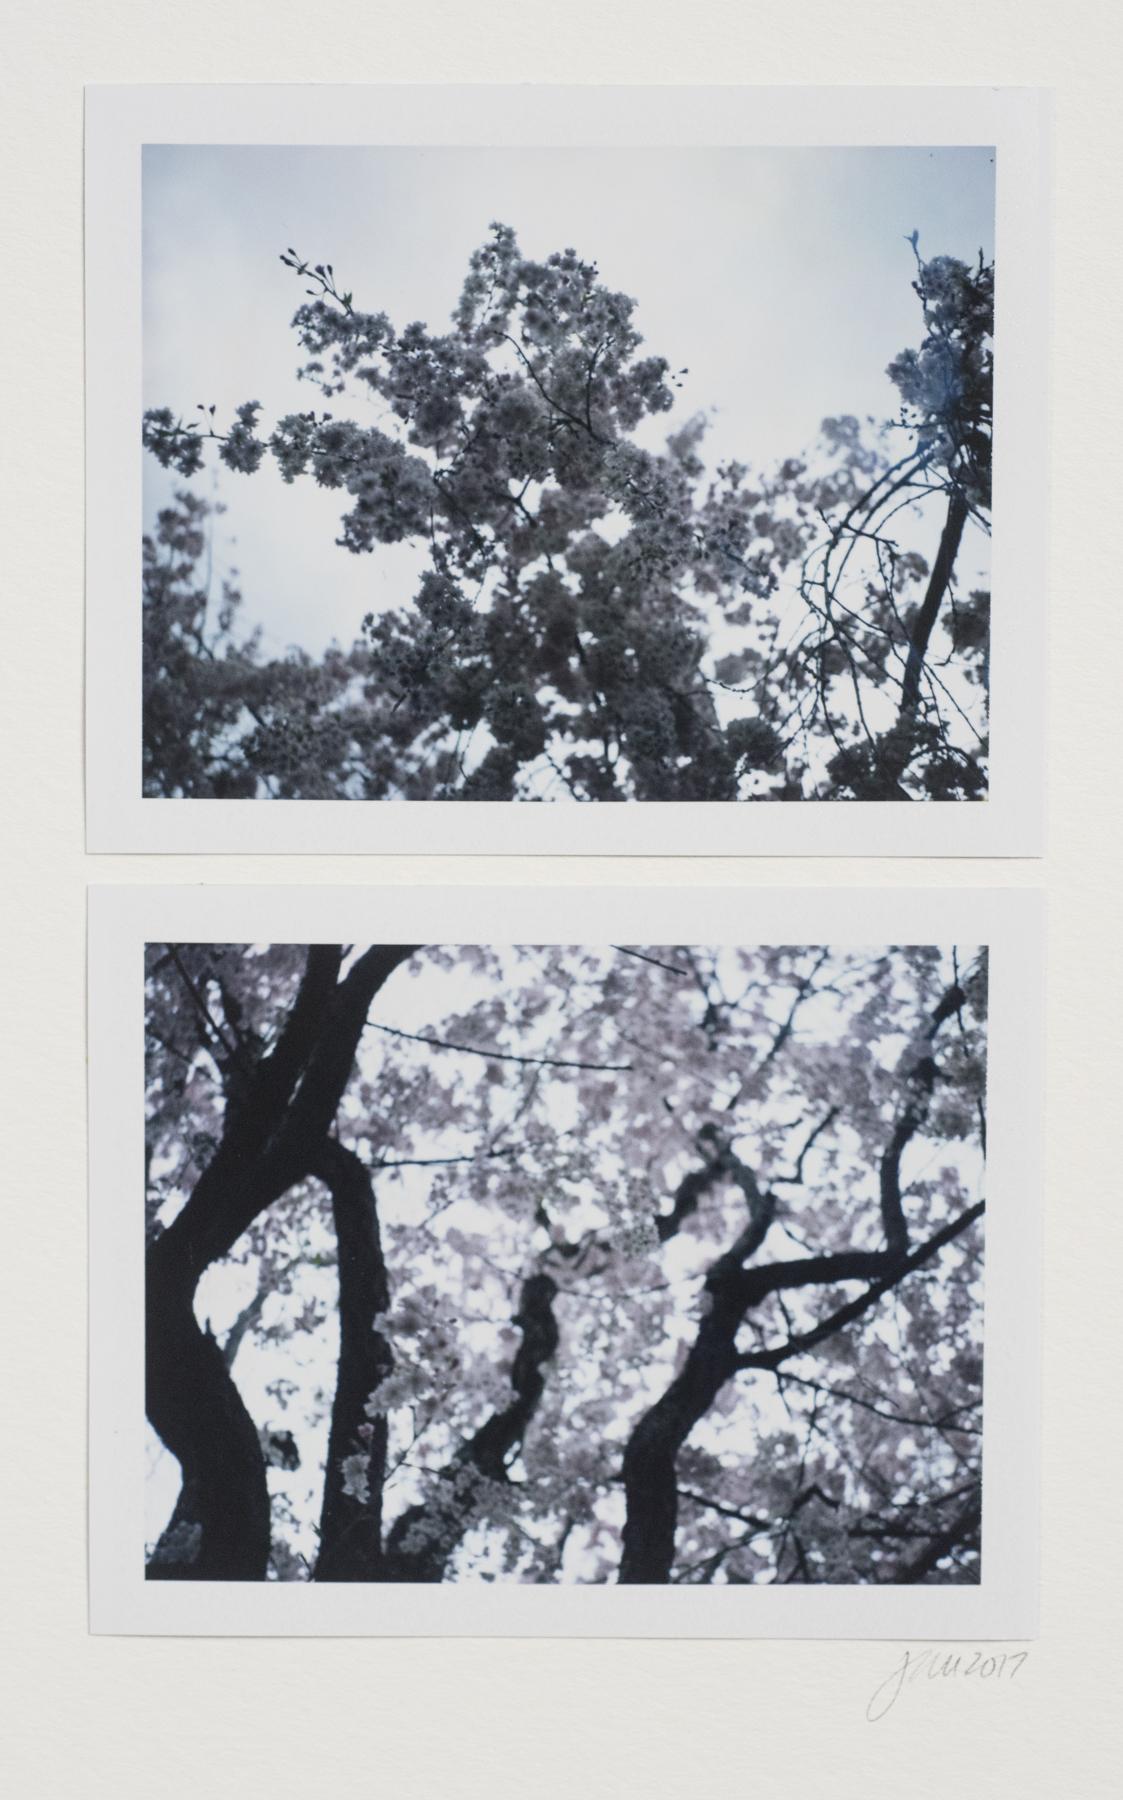 Weeping From Below | Polaroid Land Camera Auto 100 | Diptichon Paper | Jocelyn Mathewes